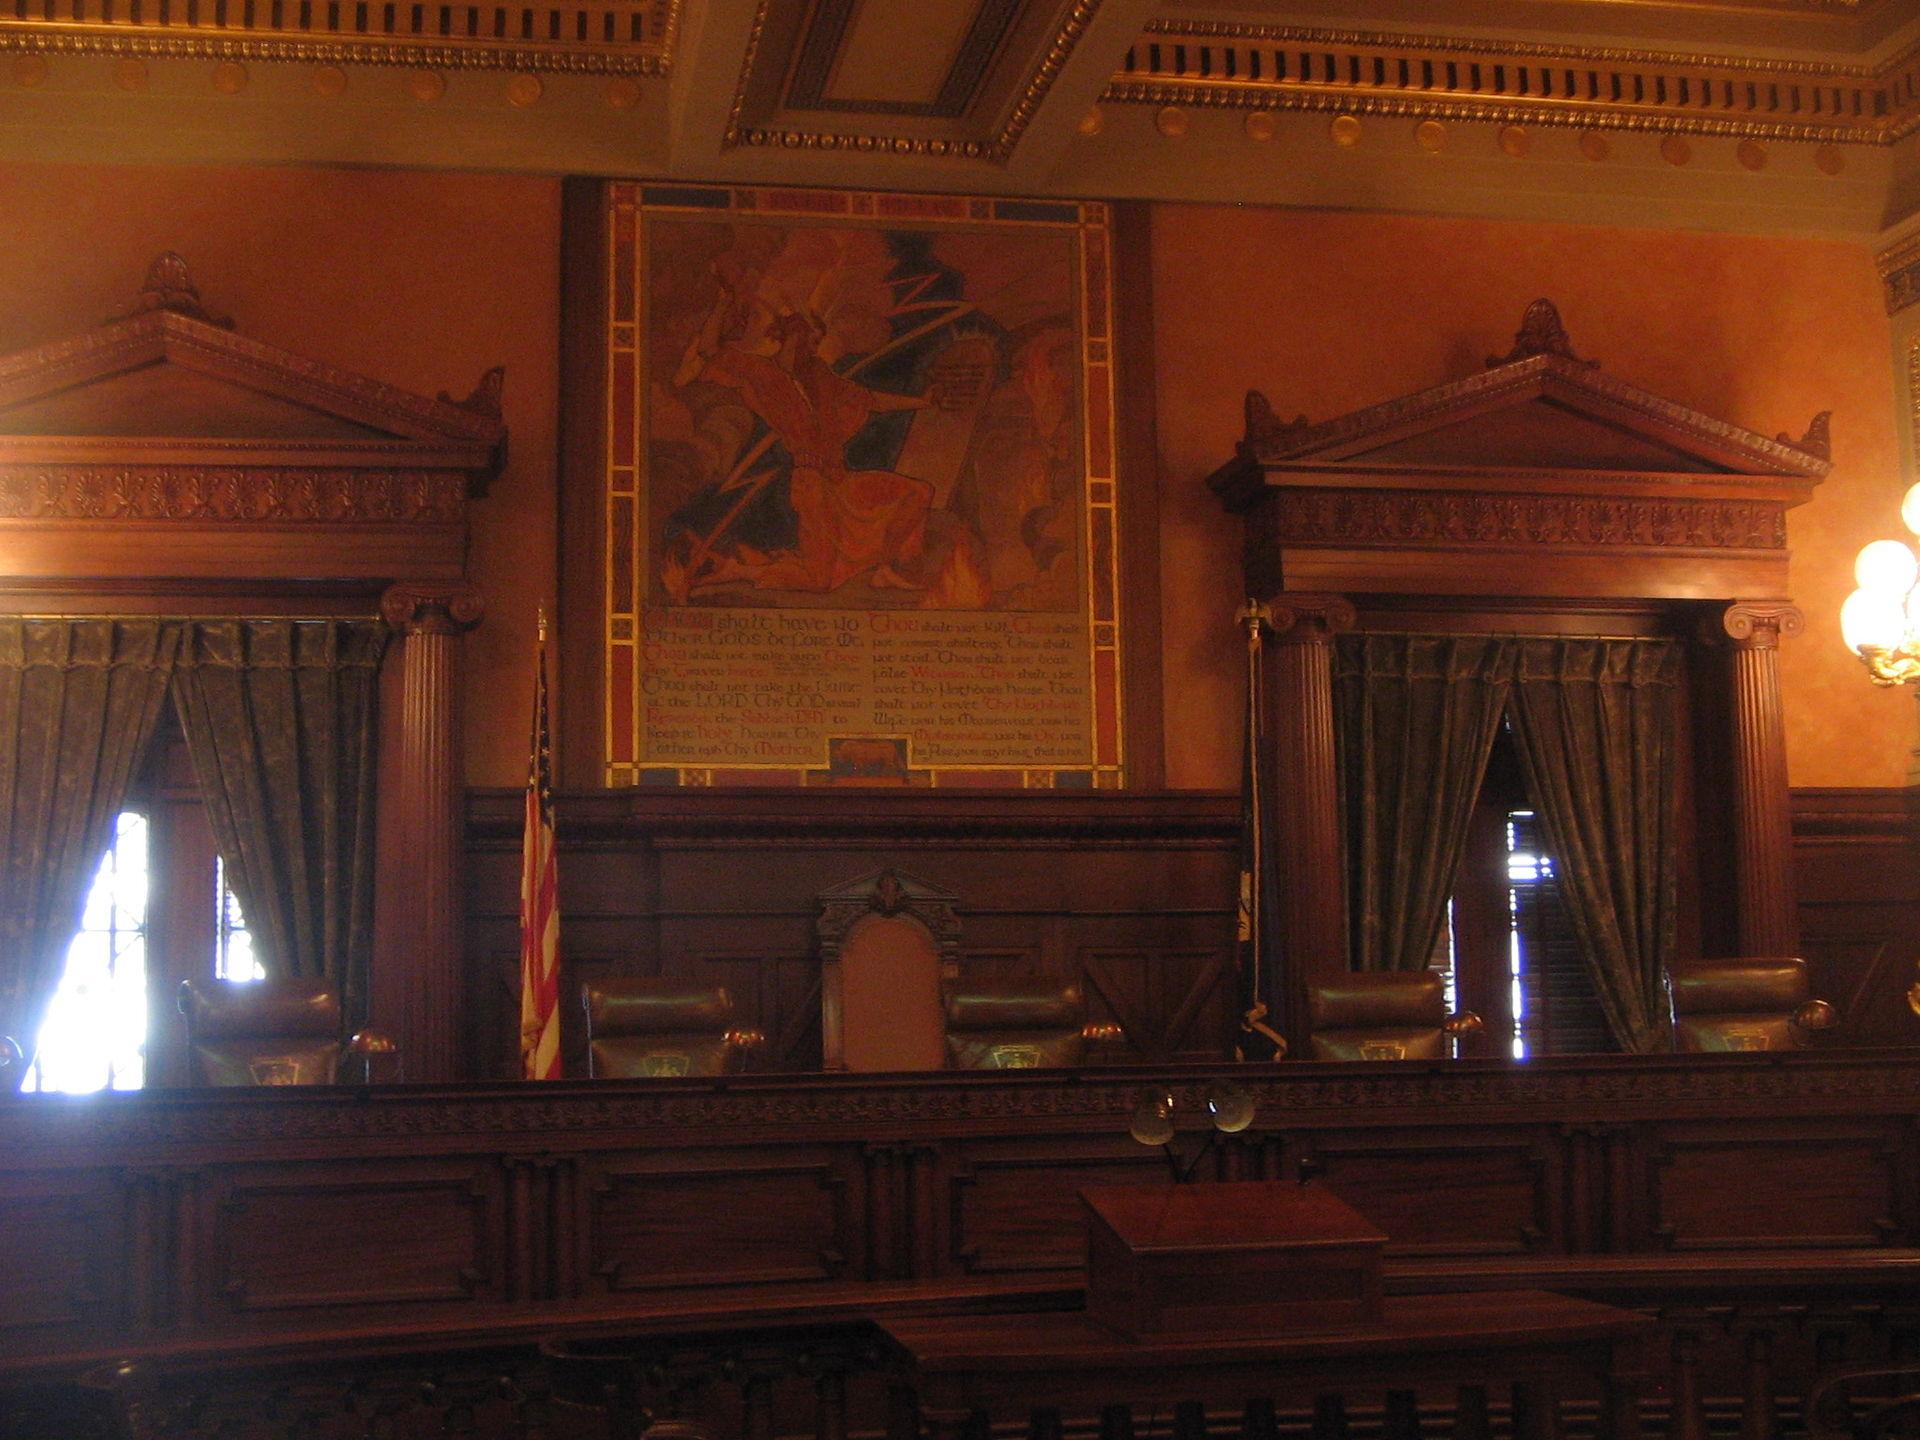 Judges' seats Inside Pennsylvania Supreme Court